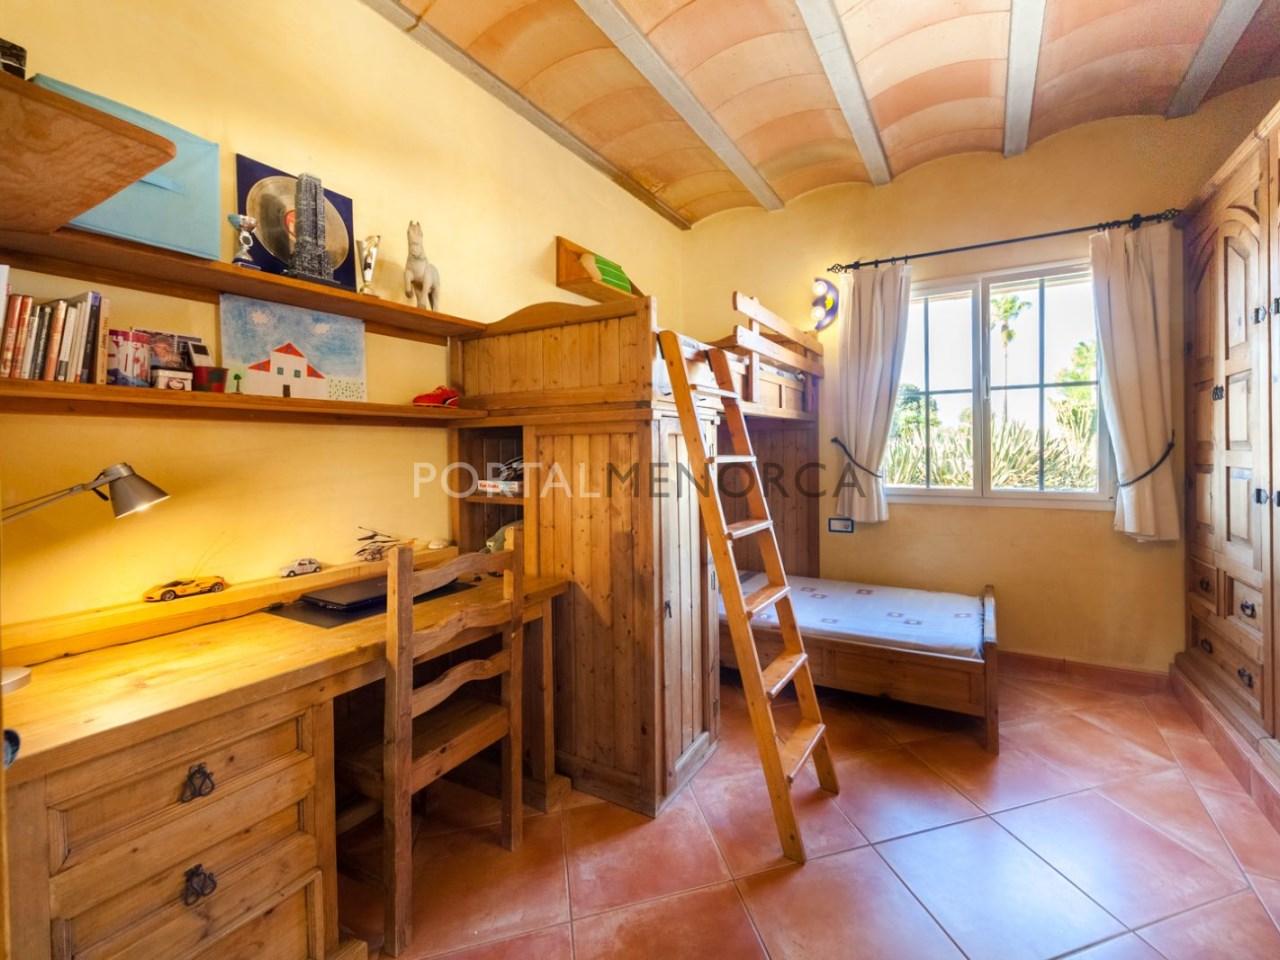 Casa de campo con piscina en Menorca (15 de 41)